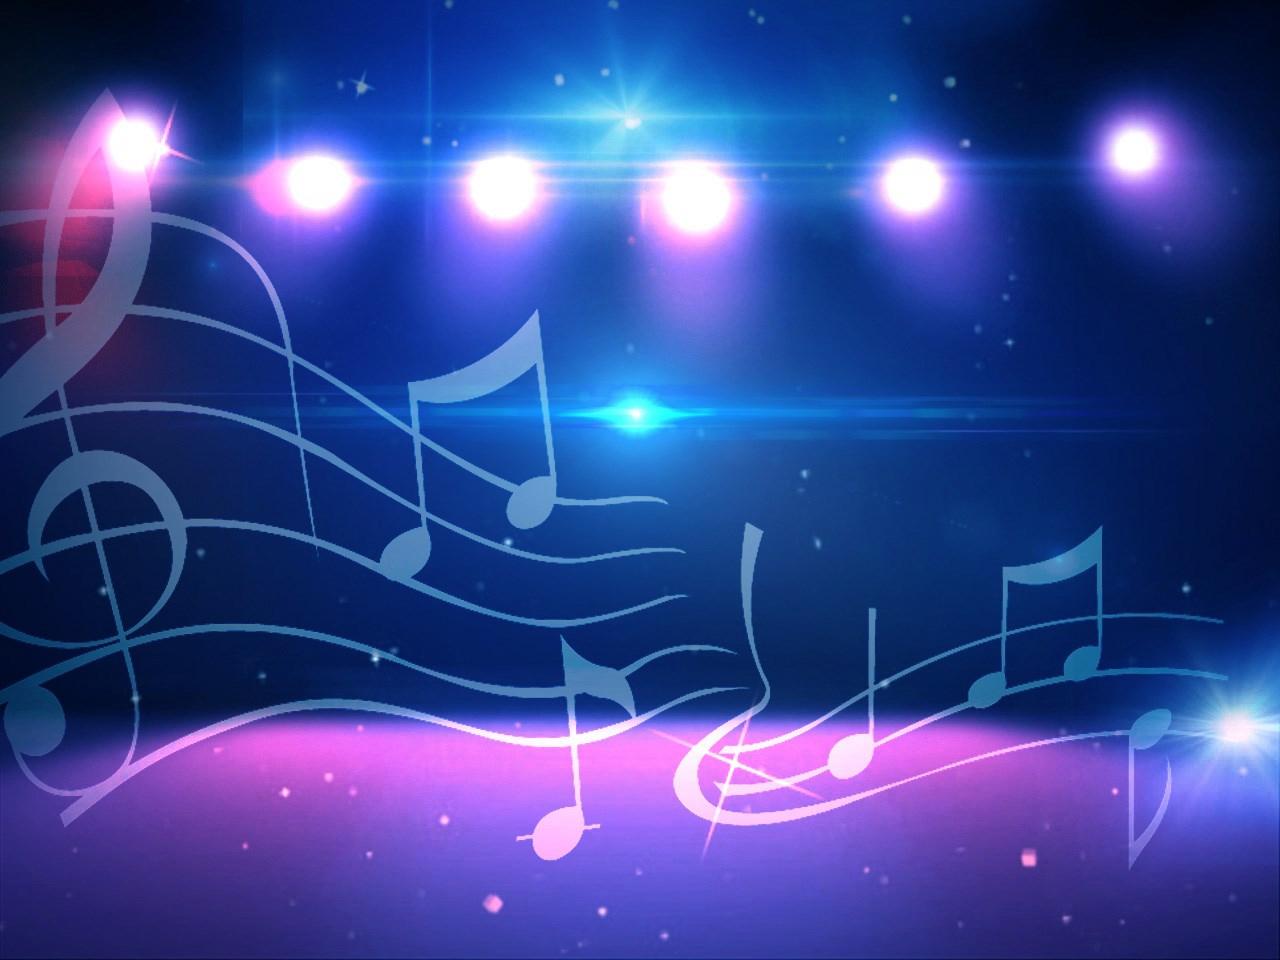 music __1557361424171.jpg.jpg